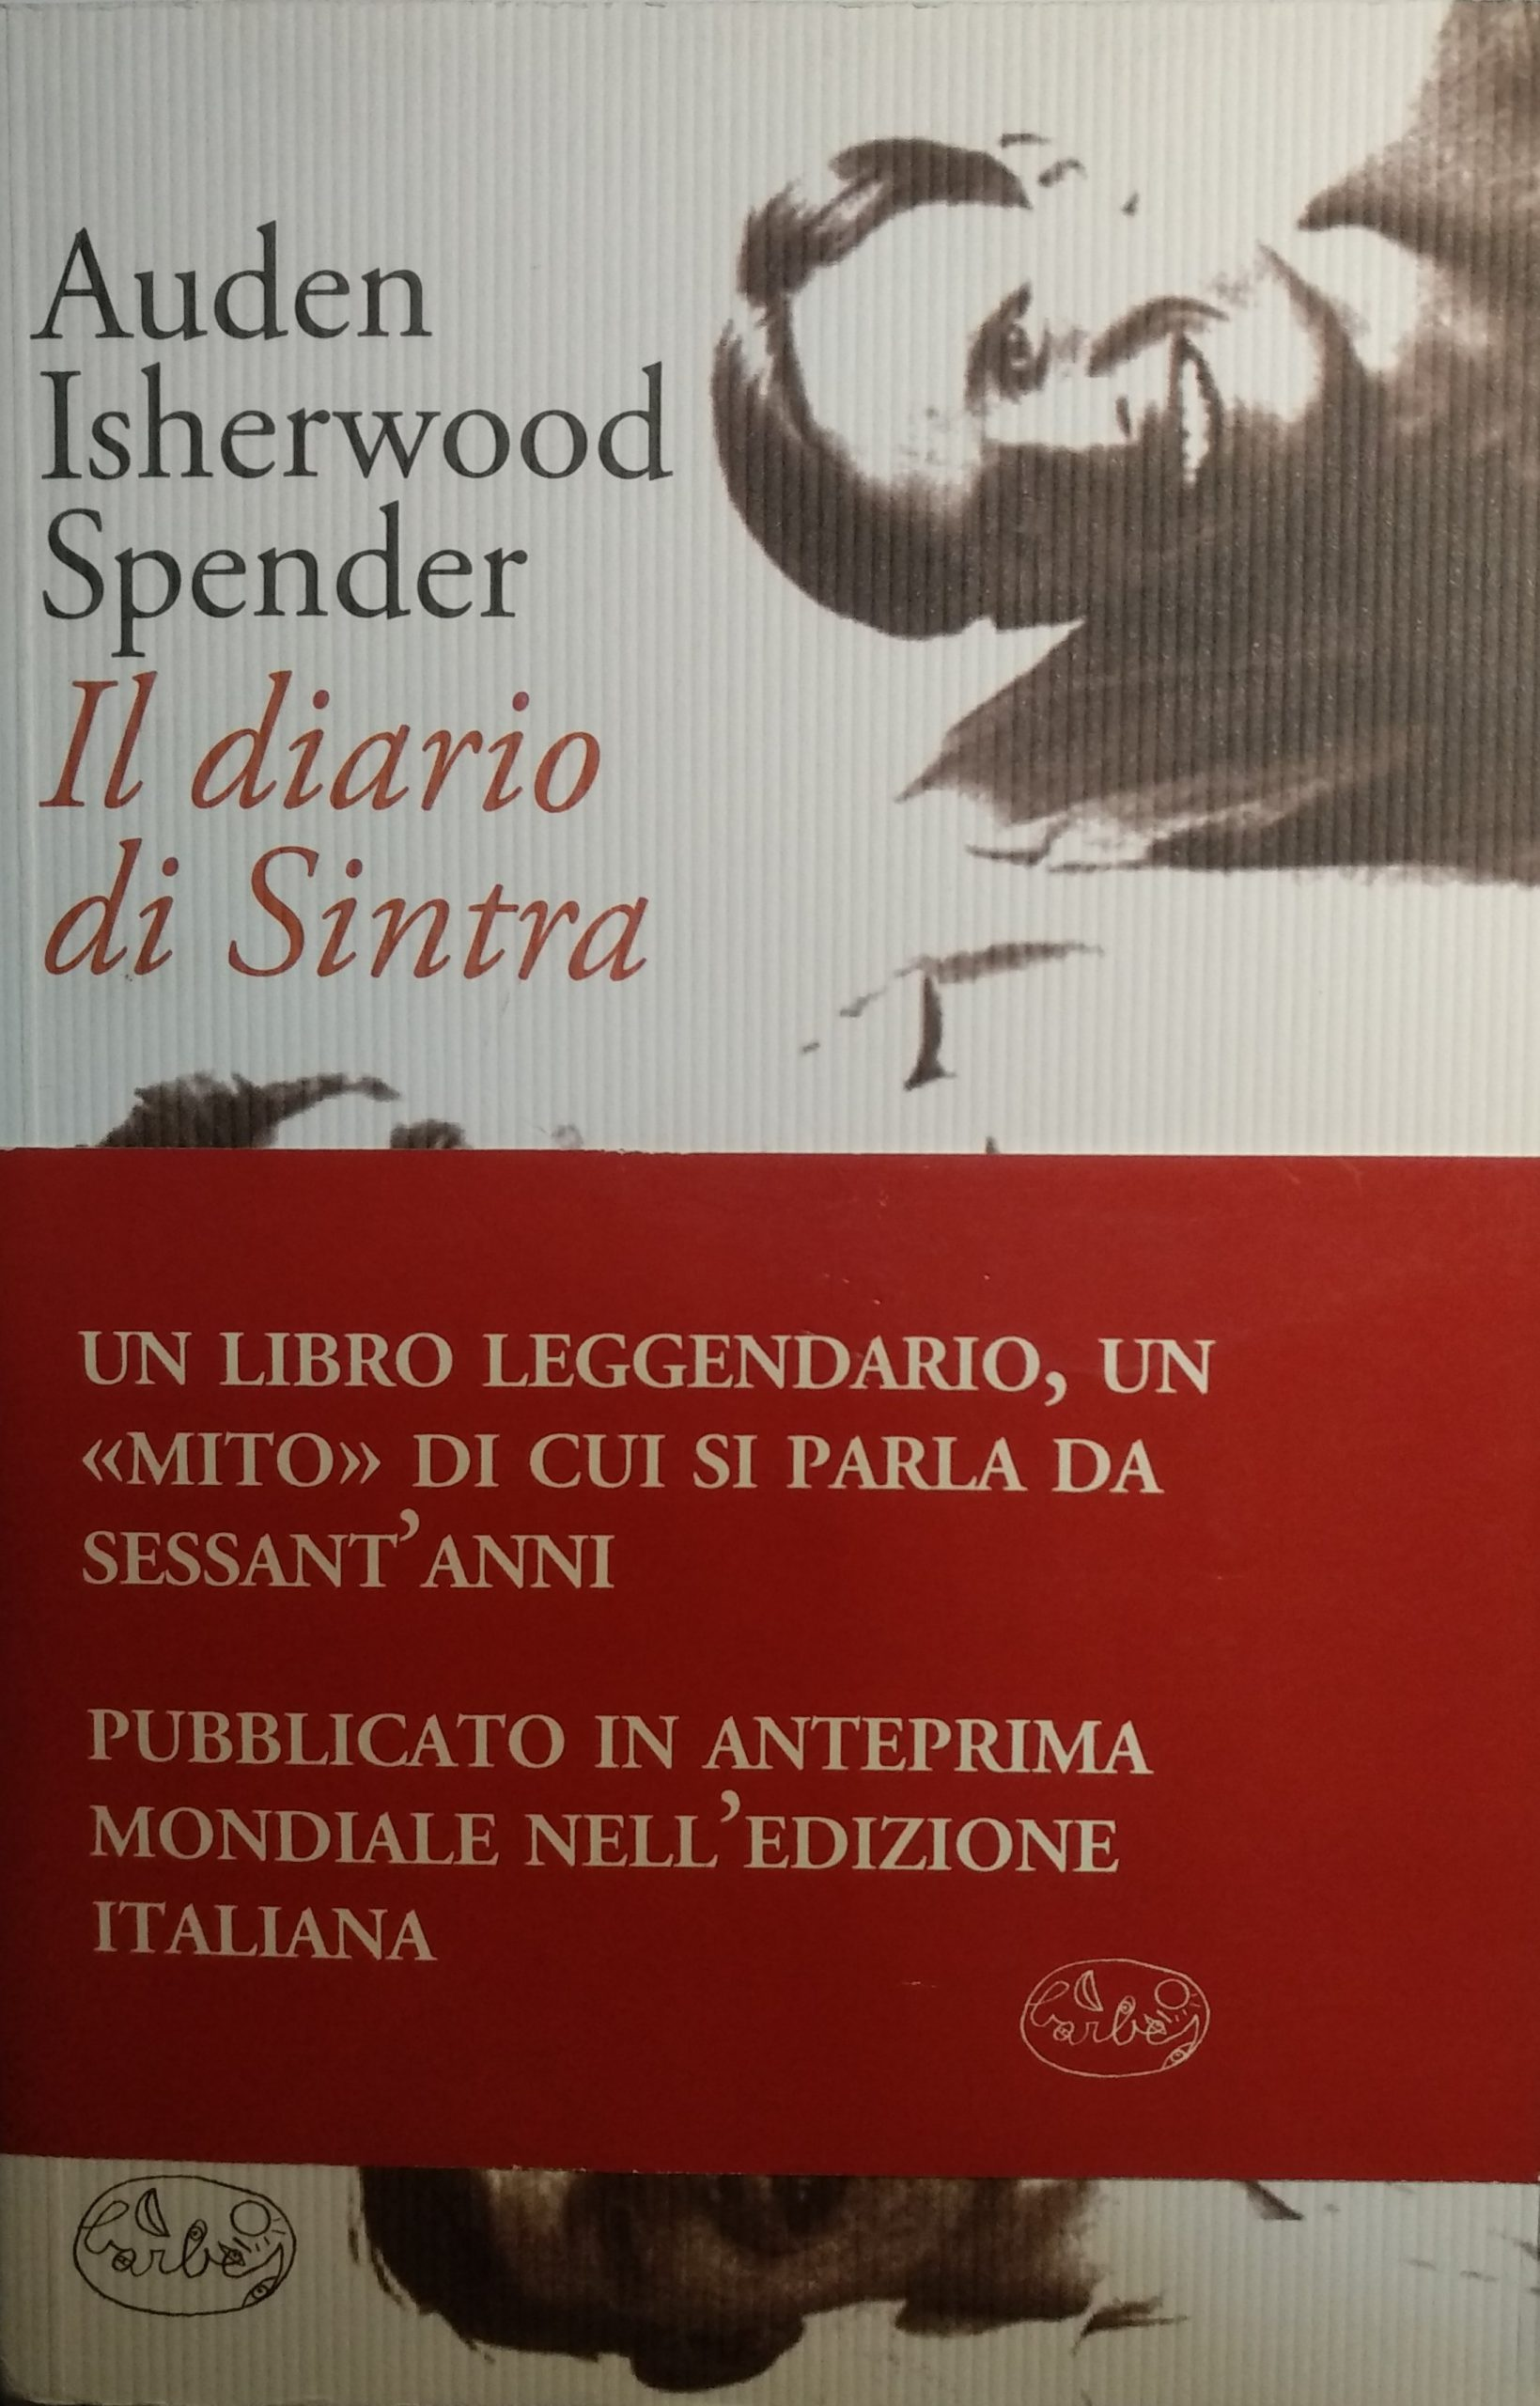 """Il diario di Sintra"": una prima mondiale assoluta targata Barbès di Firenze"